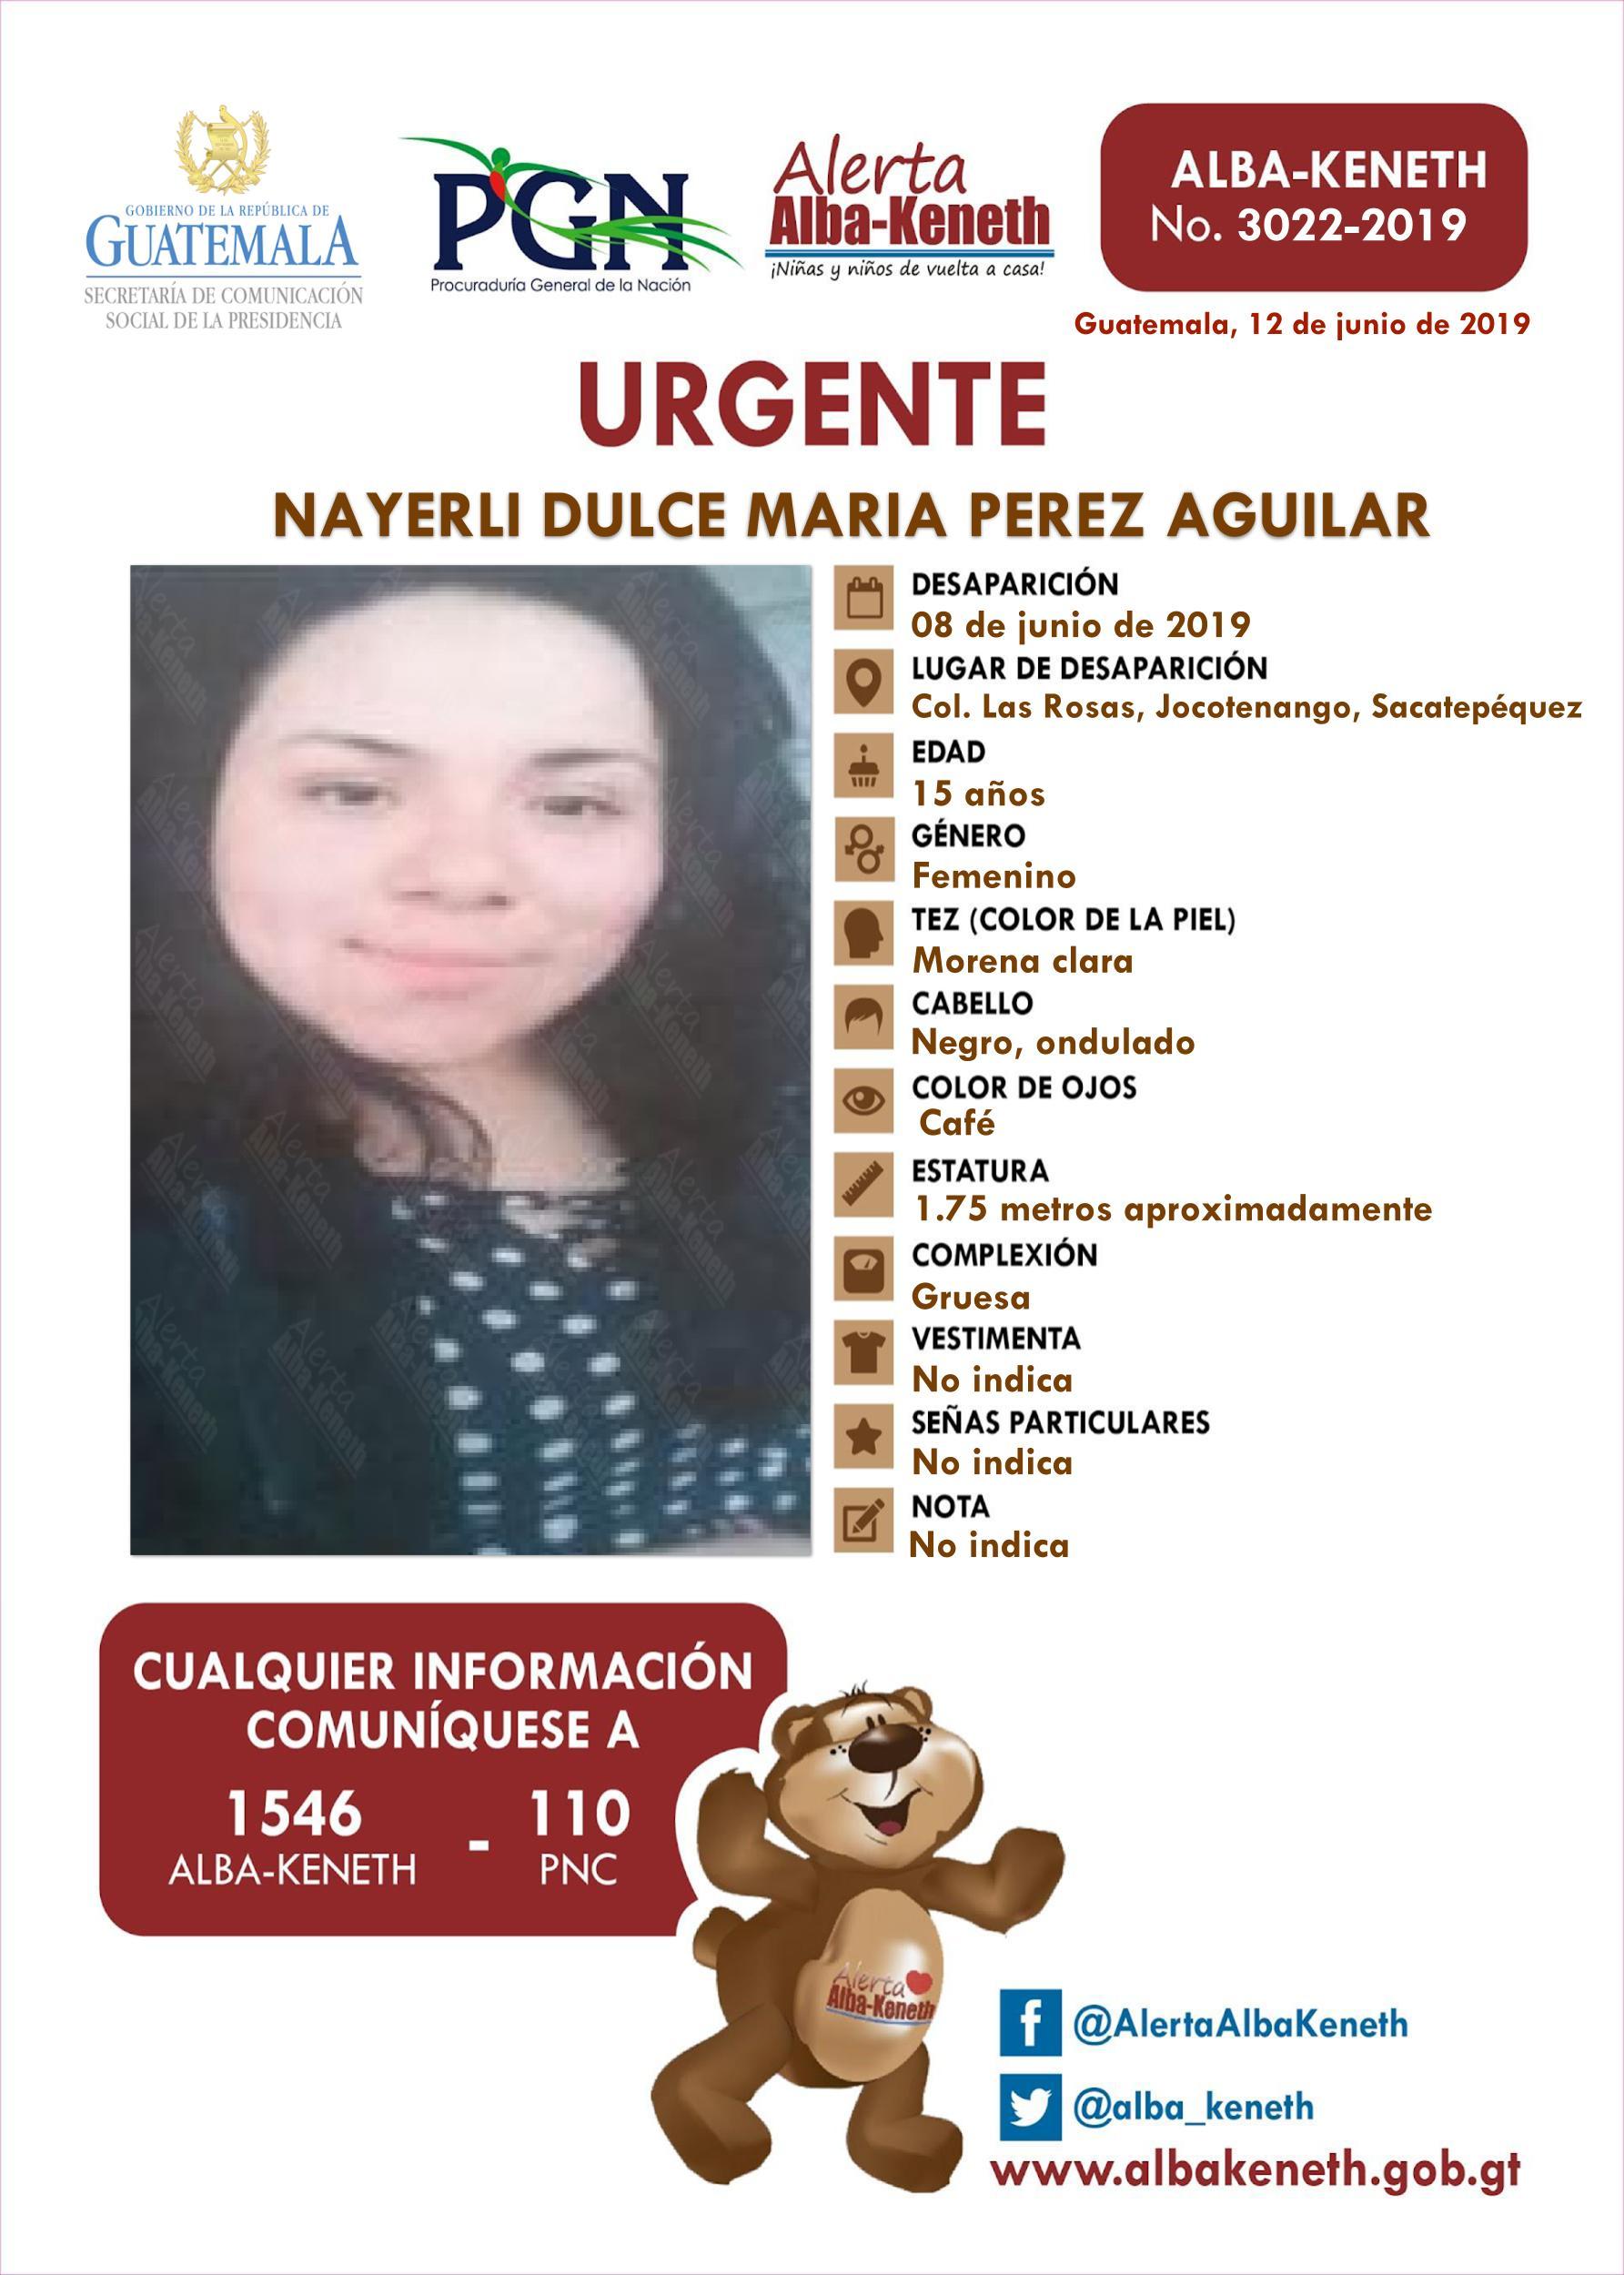 Nayerli Dulce Maria Perez Aguilar